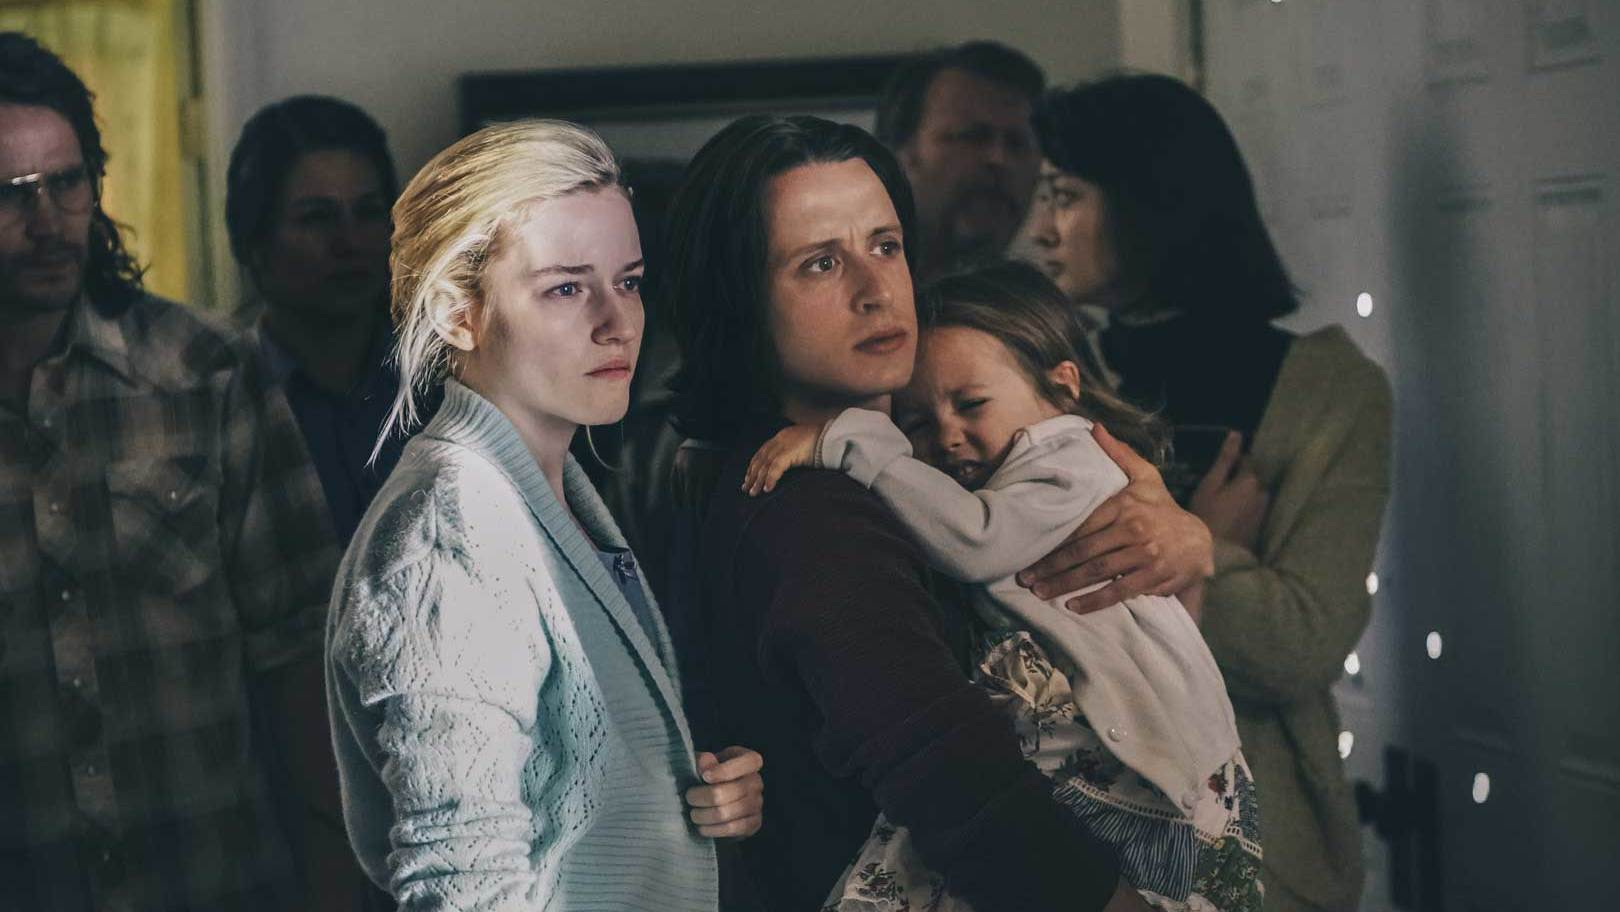 Judy Kelly,Sayantika Banerjee Erotic movies Erin Gray,Lais Oliveira BRA 2016